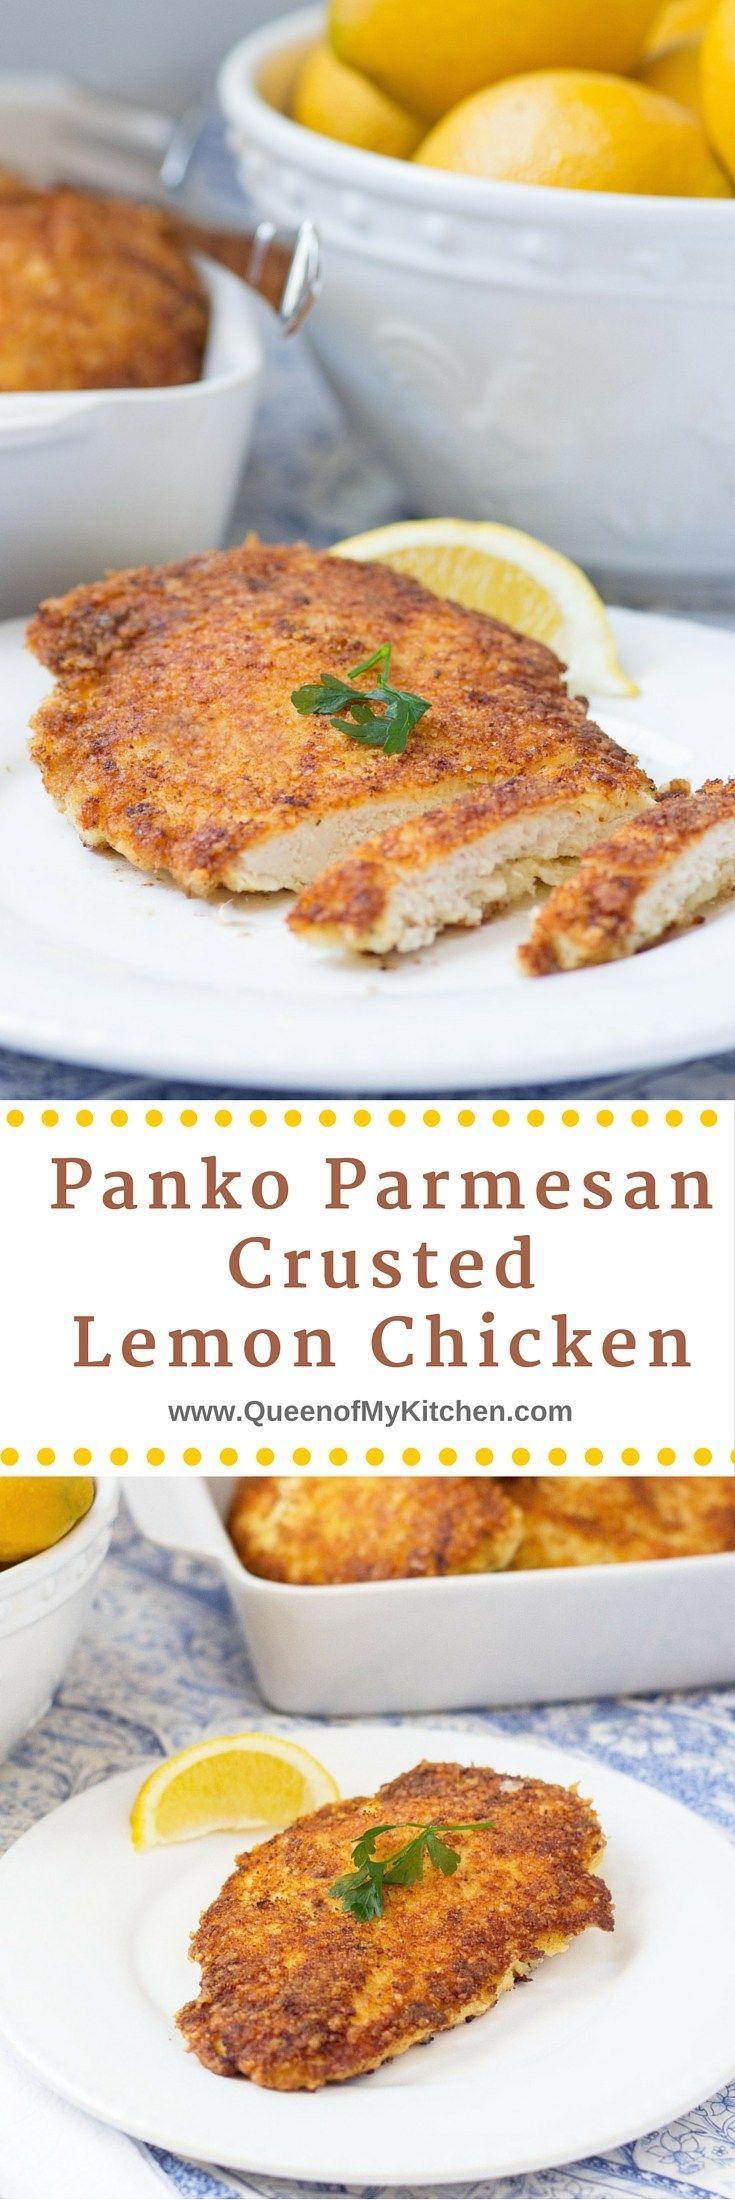 down - the best lemon chicken ever!! Panko Parmesan Crusted Lemon ...